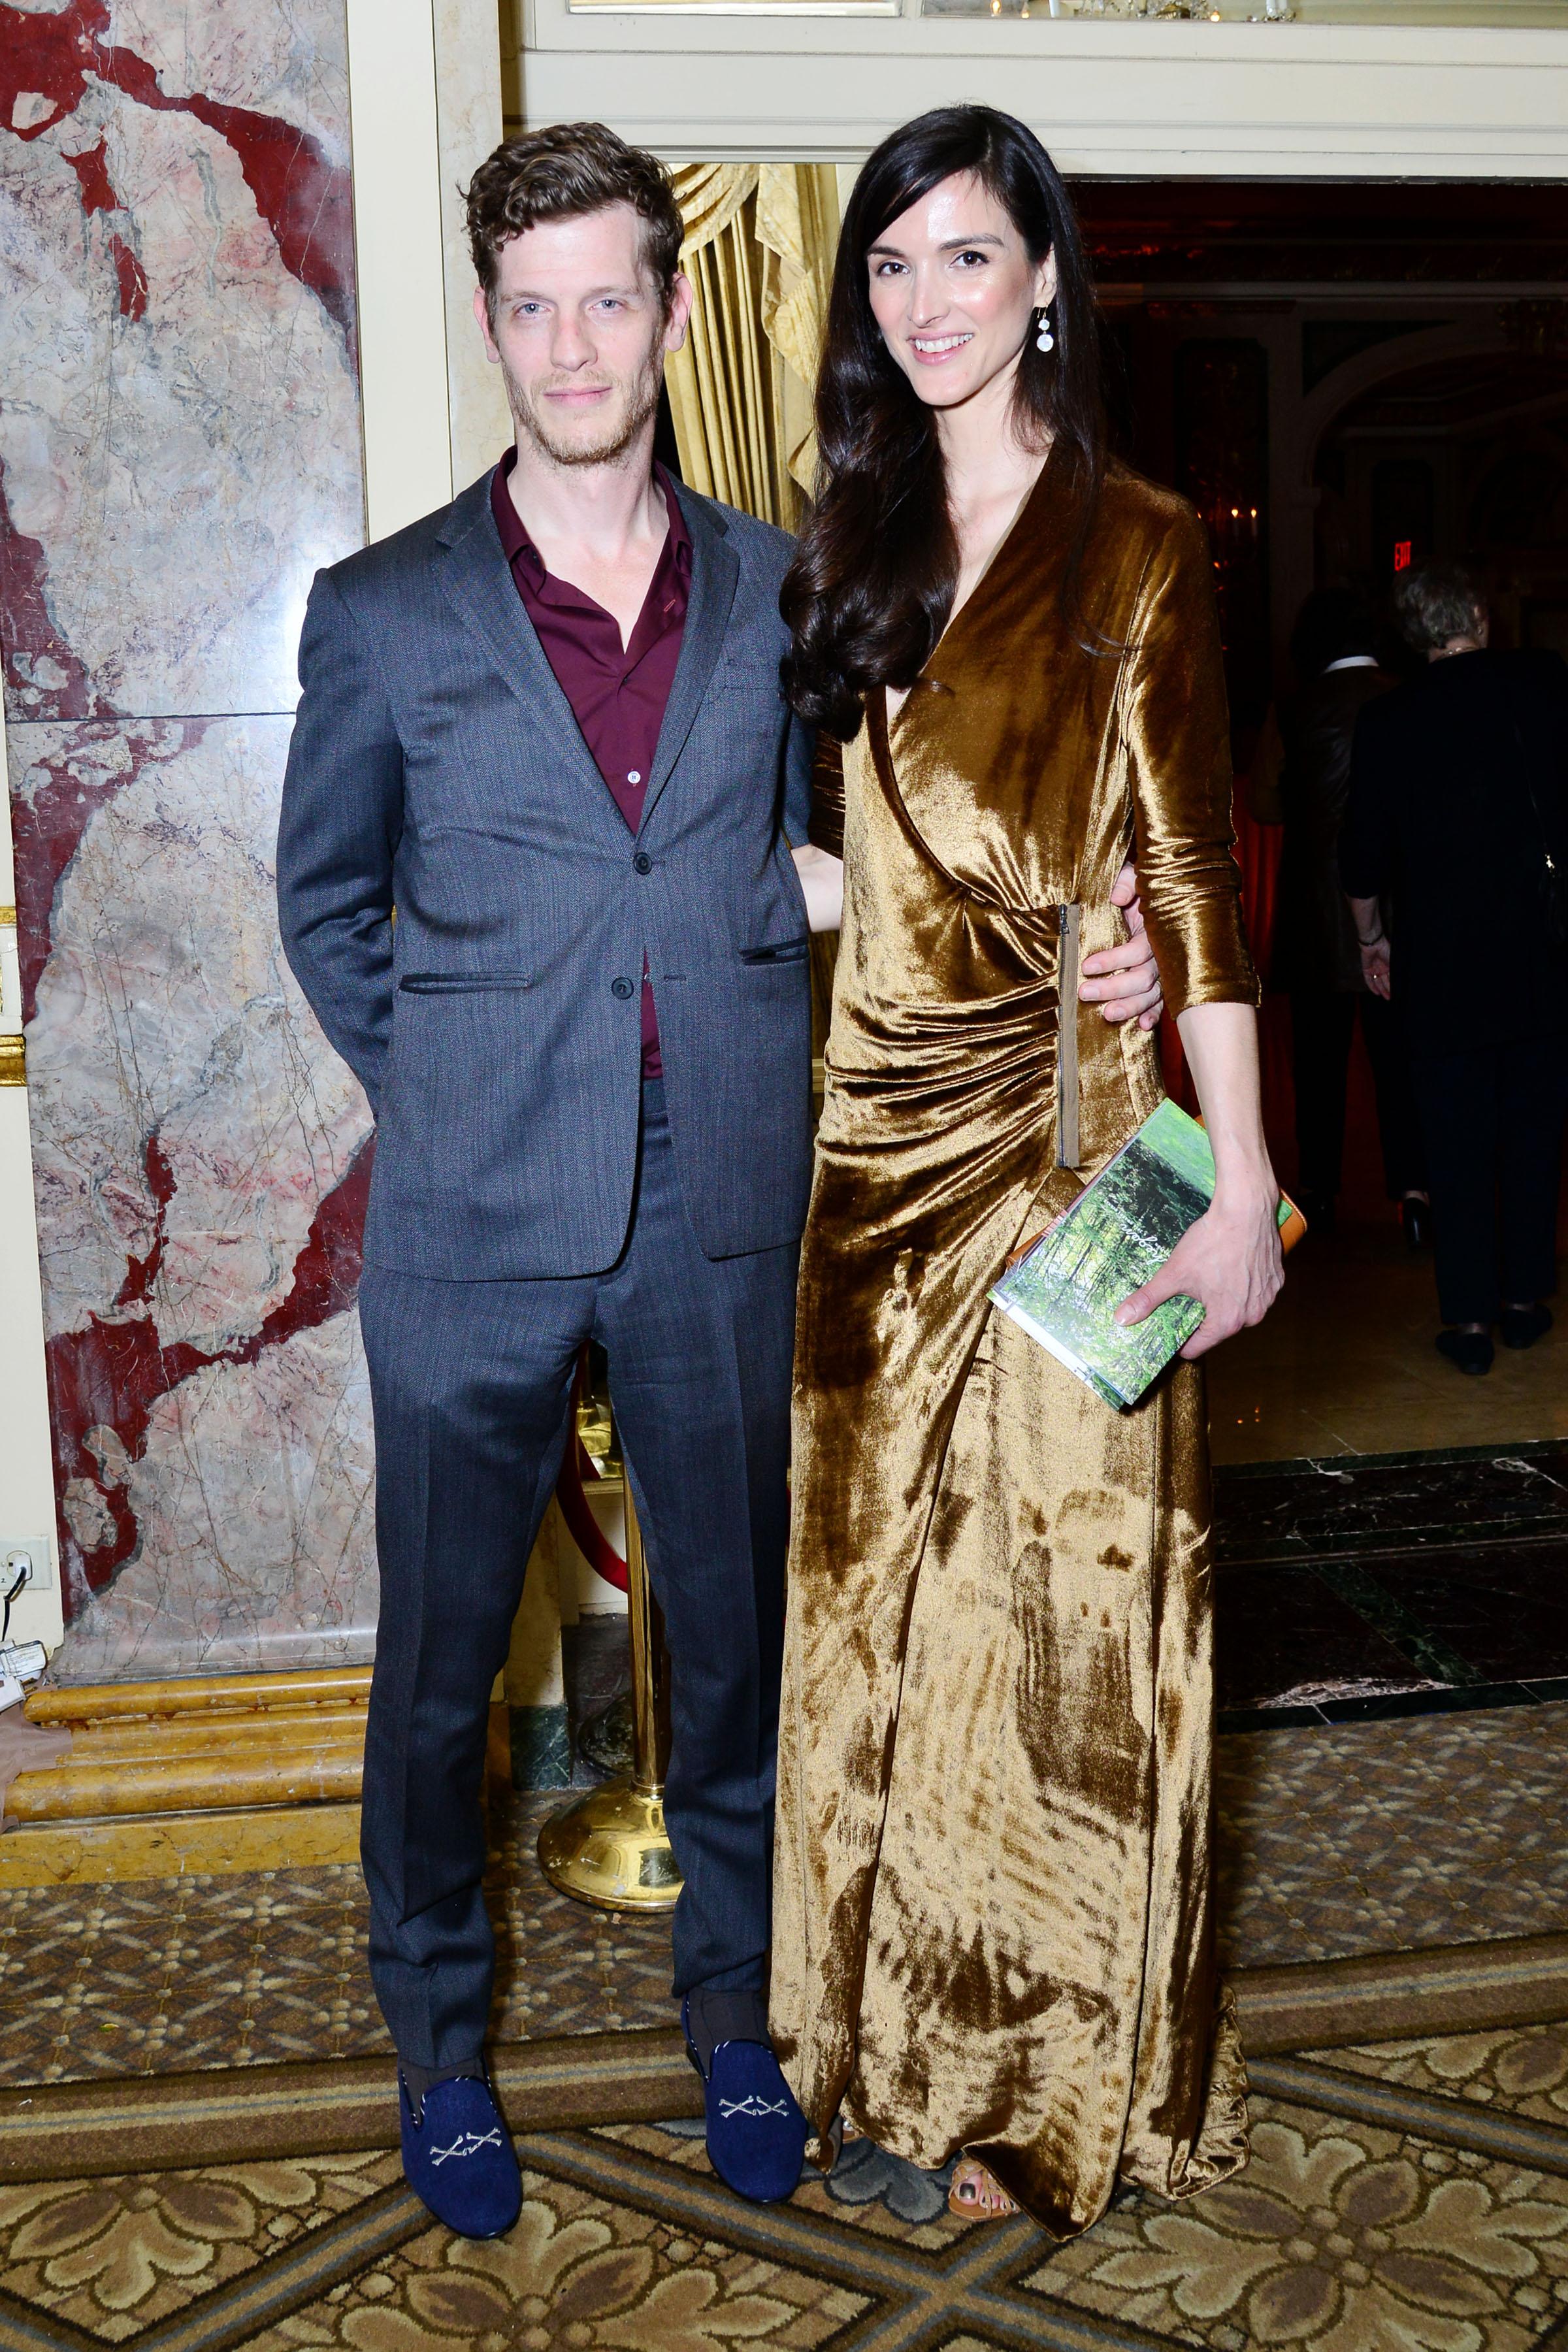 Damian Loeb, Zoya Loeb==Skowhegan 70th Anniversary Celebration & 2016 Awards Dinner== The Plaza, NYC==April 26, 2016==©Patrick McMullan==Photo – Jared Siskin/PMC==